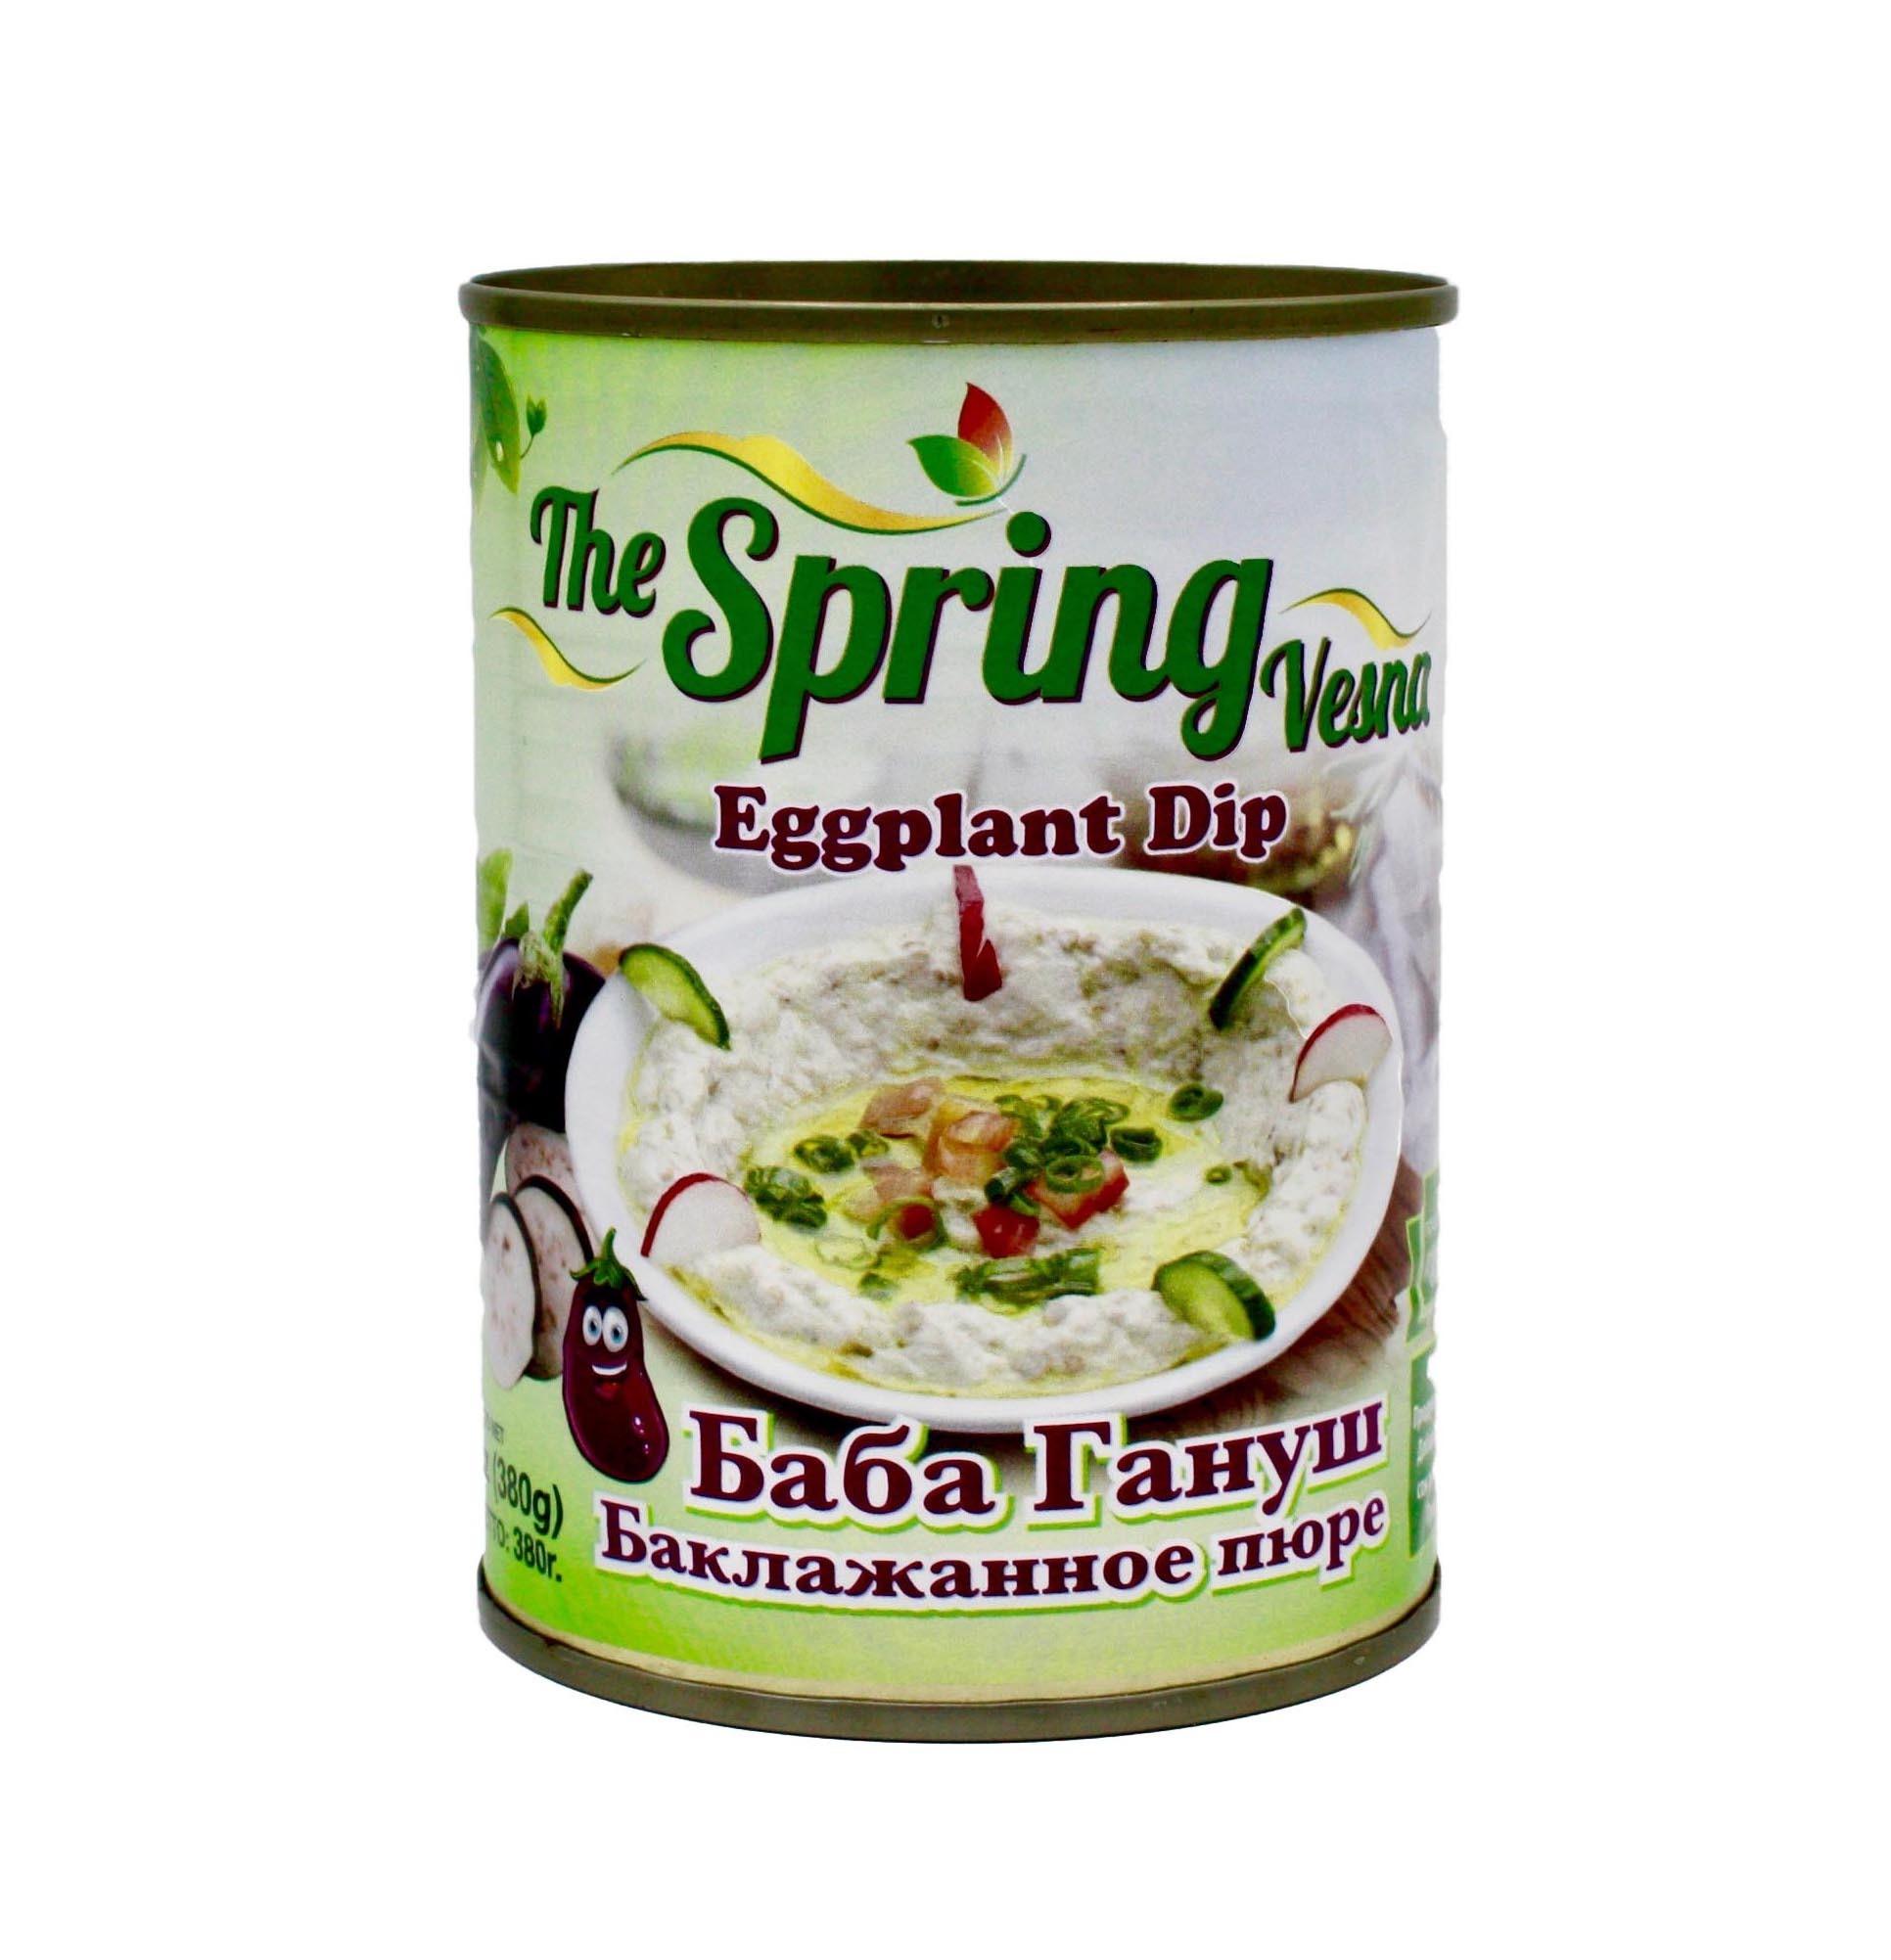 Готовые блюда, полуфабрикаты * Бабагануш The Spring, 380 г import_files_ac_acda60a95f4f11e8868b448a5b3752ae_0d3c61c35e8511e8a996484d7ecee297.jpg